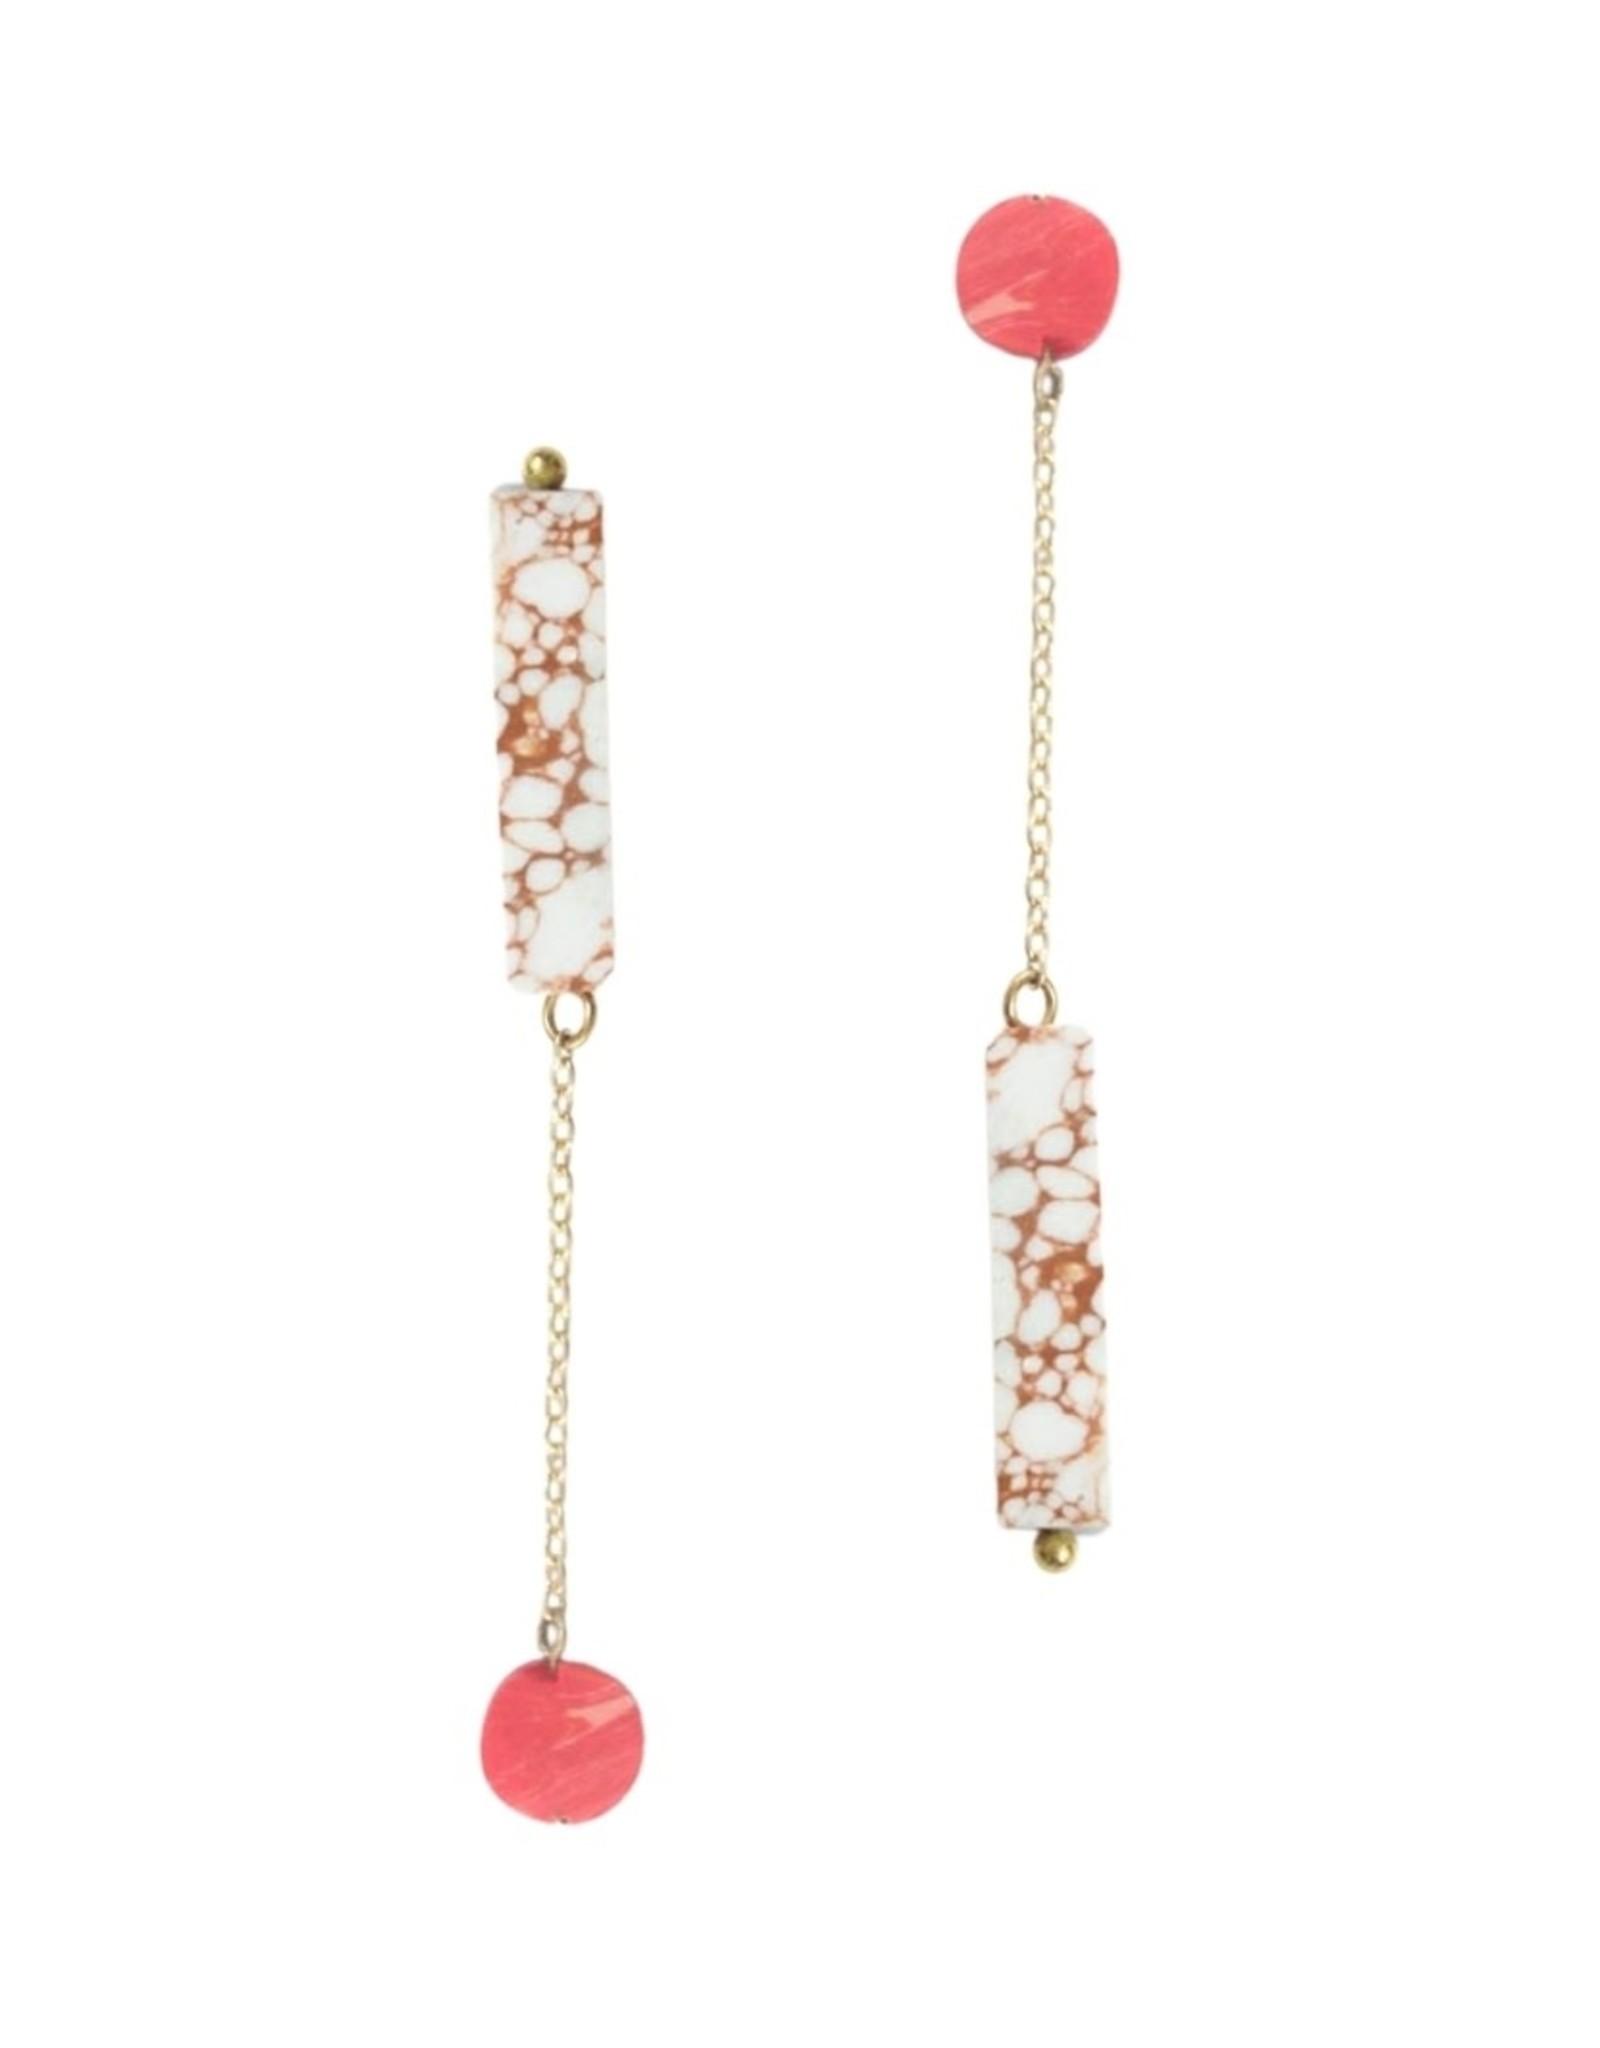 Rover & Kin Rover & Kin | Reverse Peach Claywork Earrings